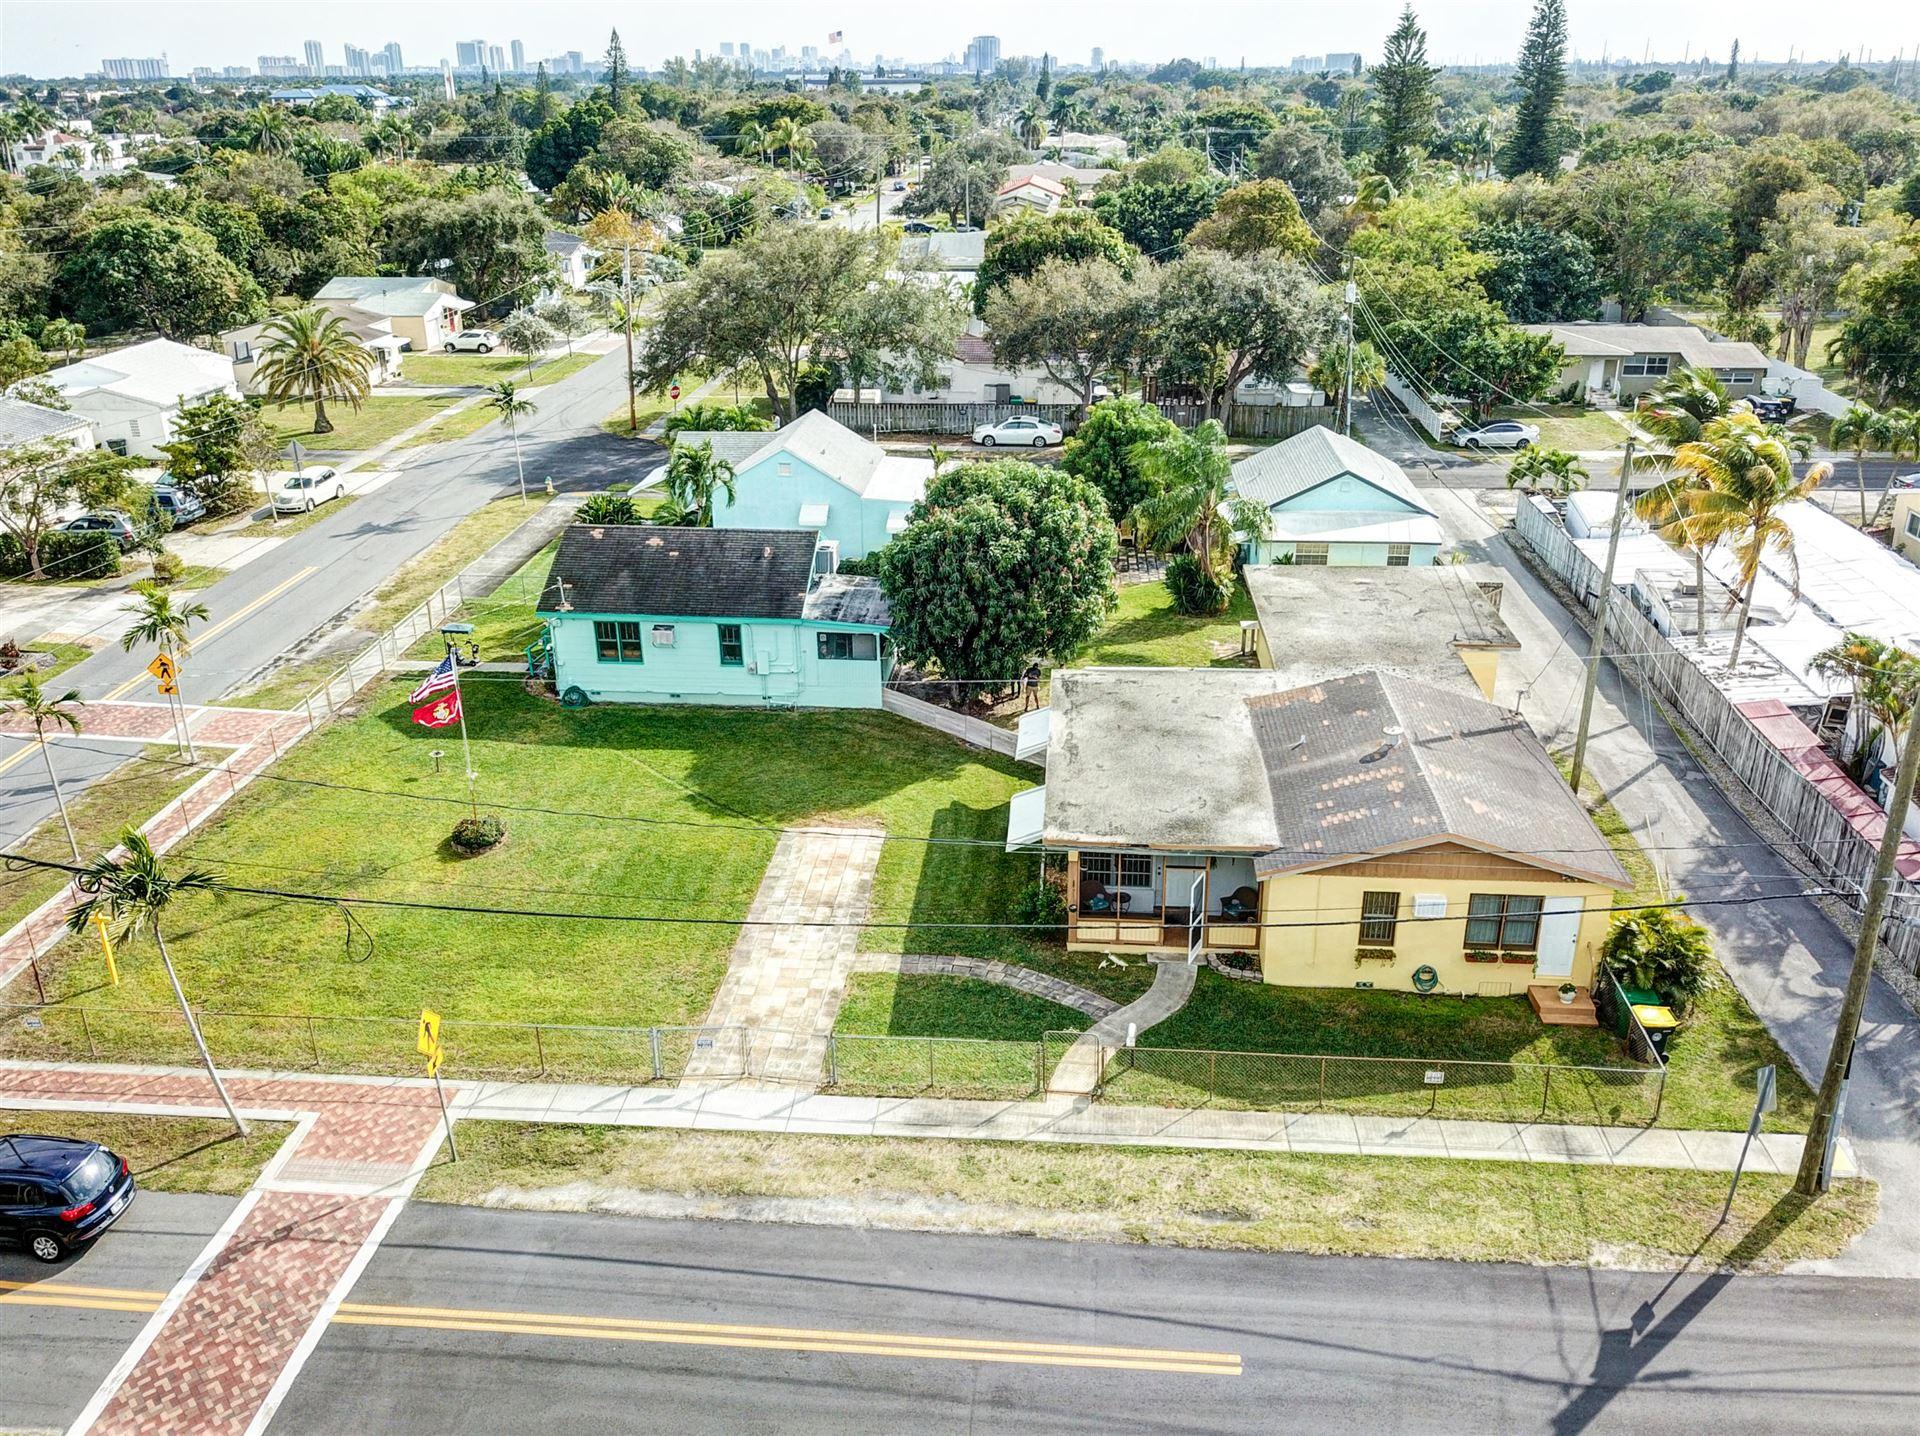 302 SW 2nd Avenue, Dania, FL 33004 - MLS#: RX-10597149